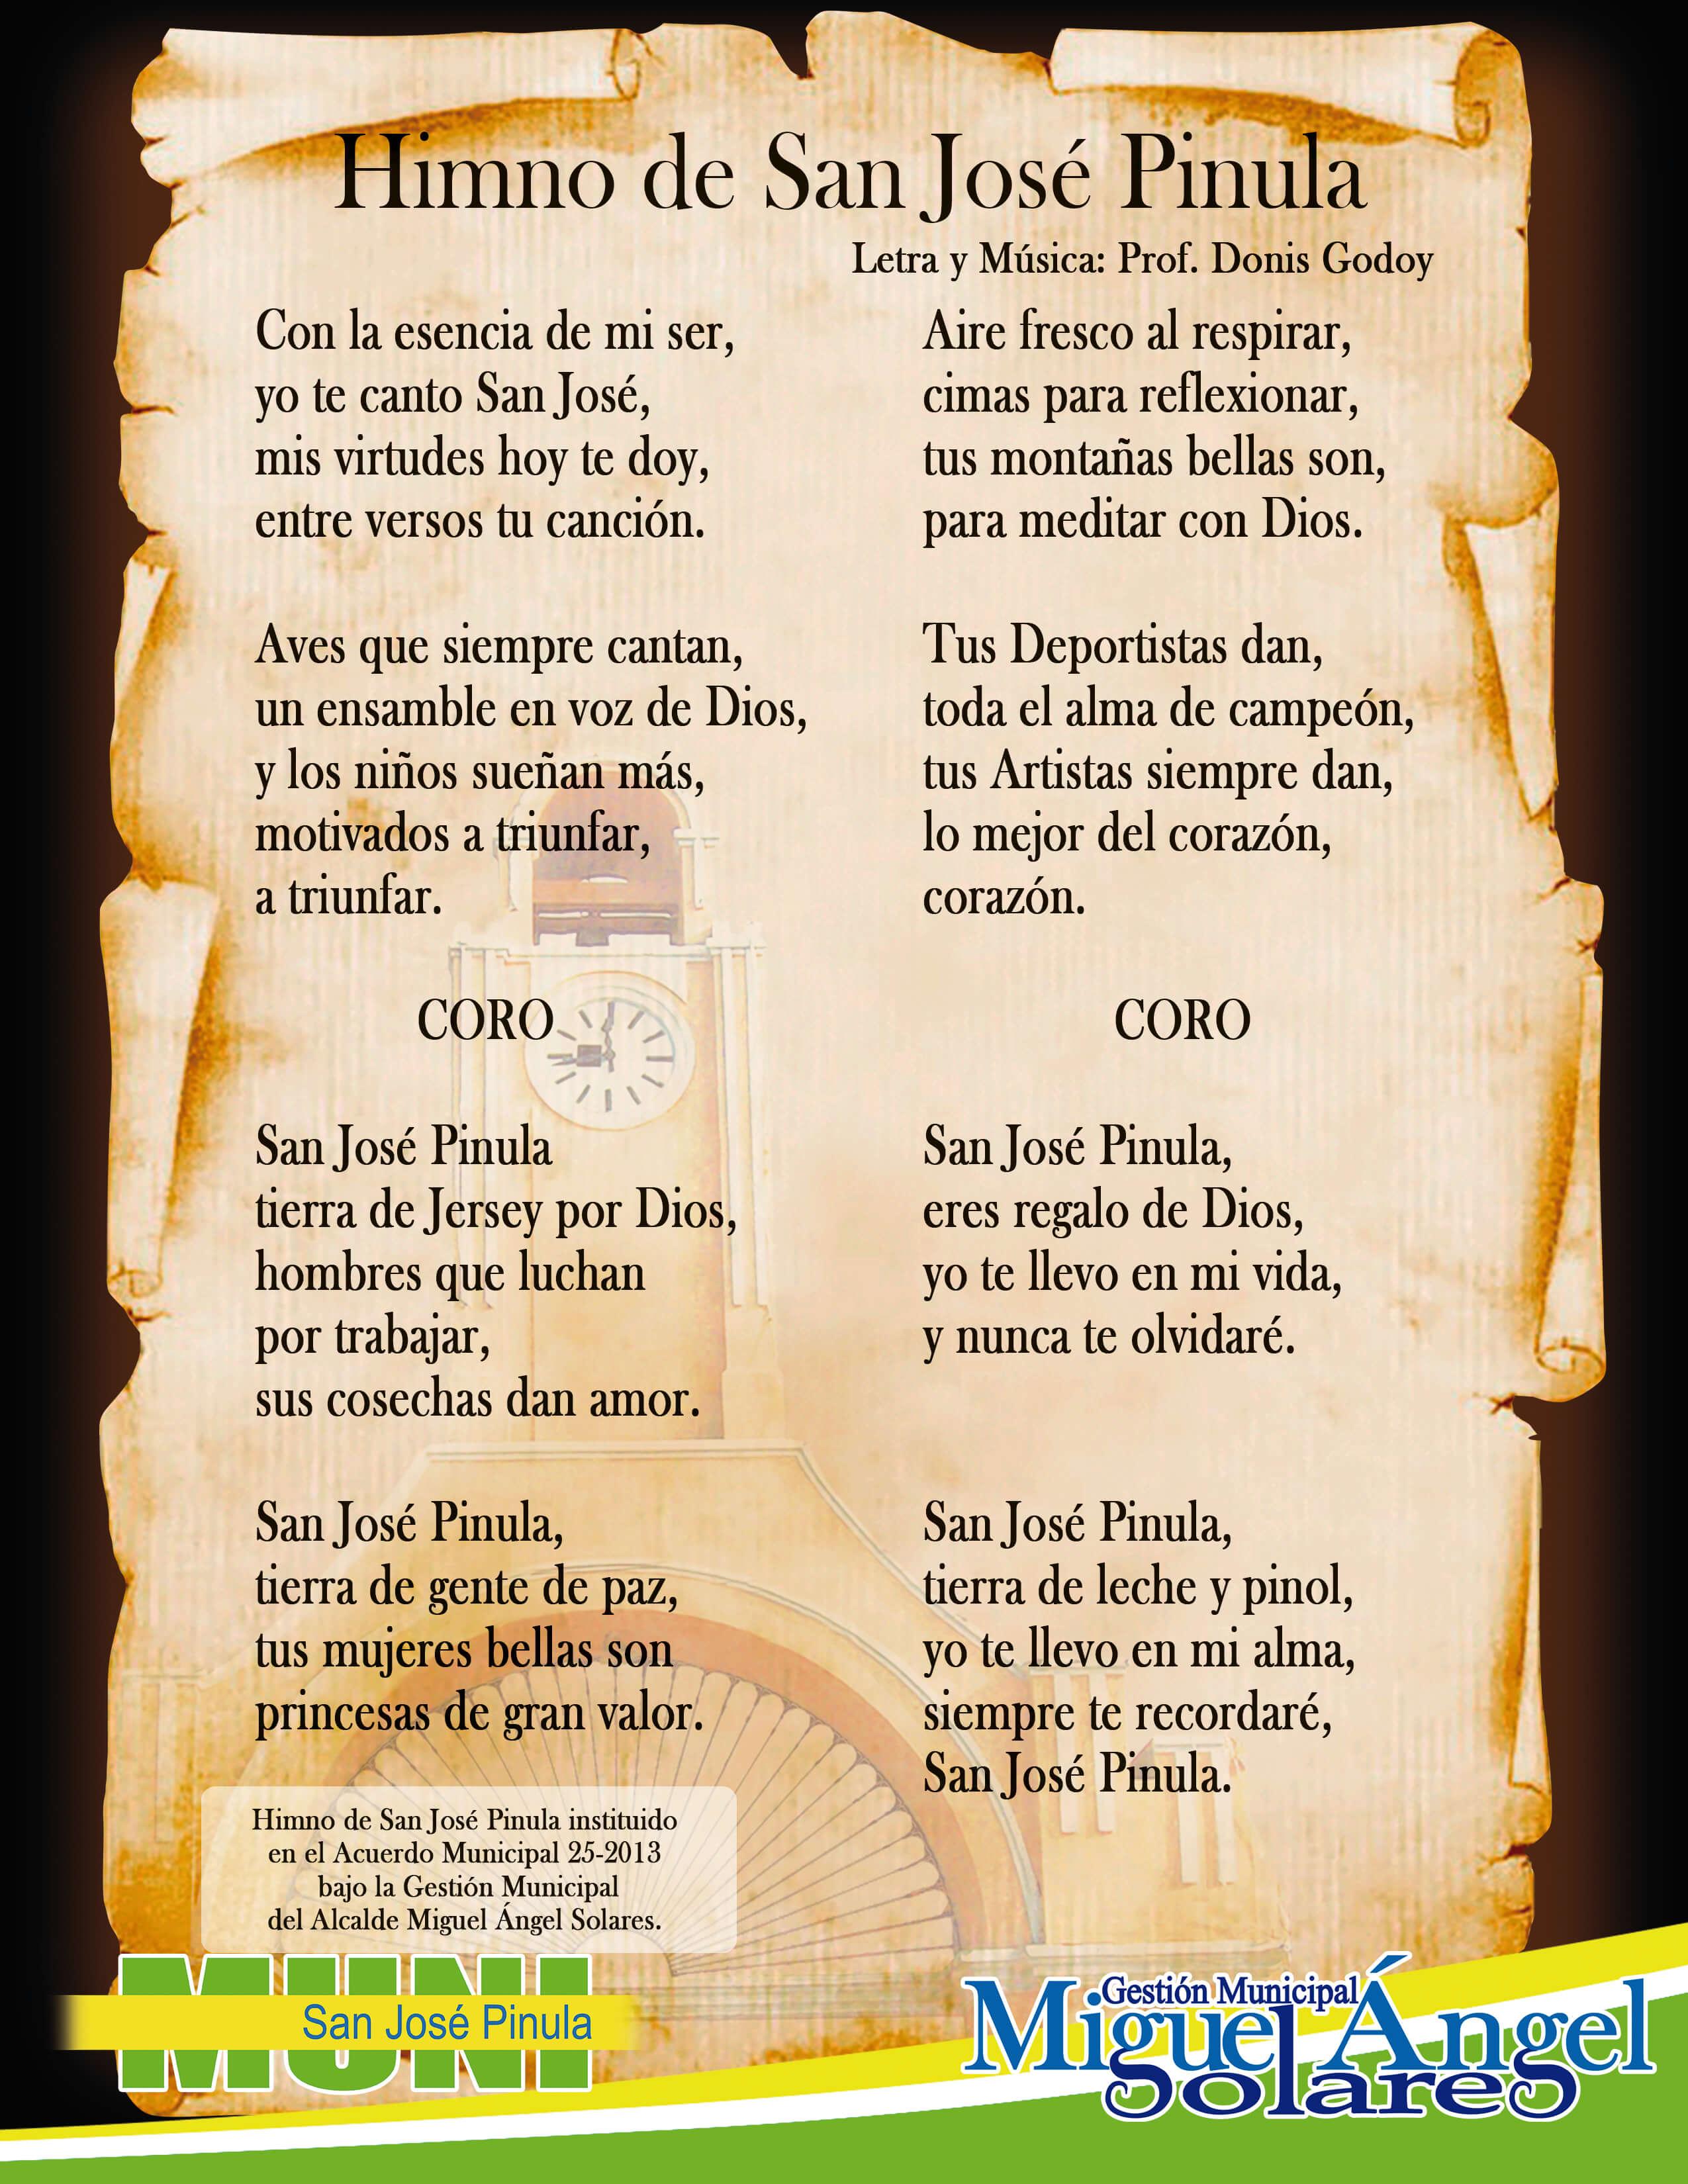 himno SJP carta